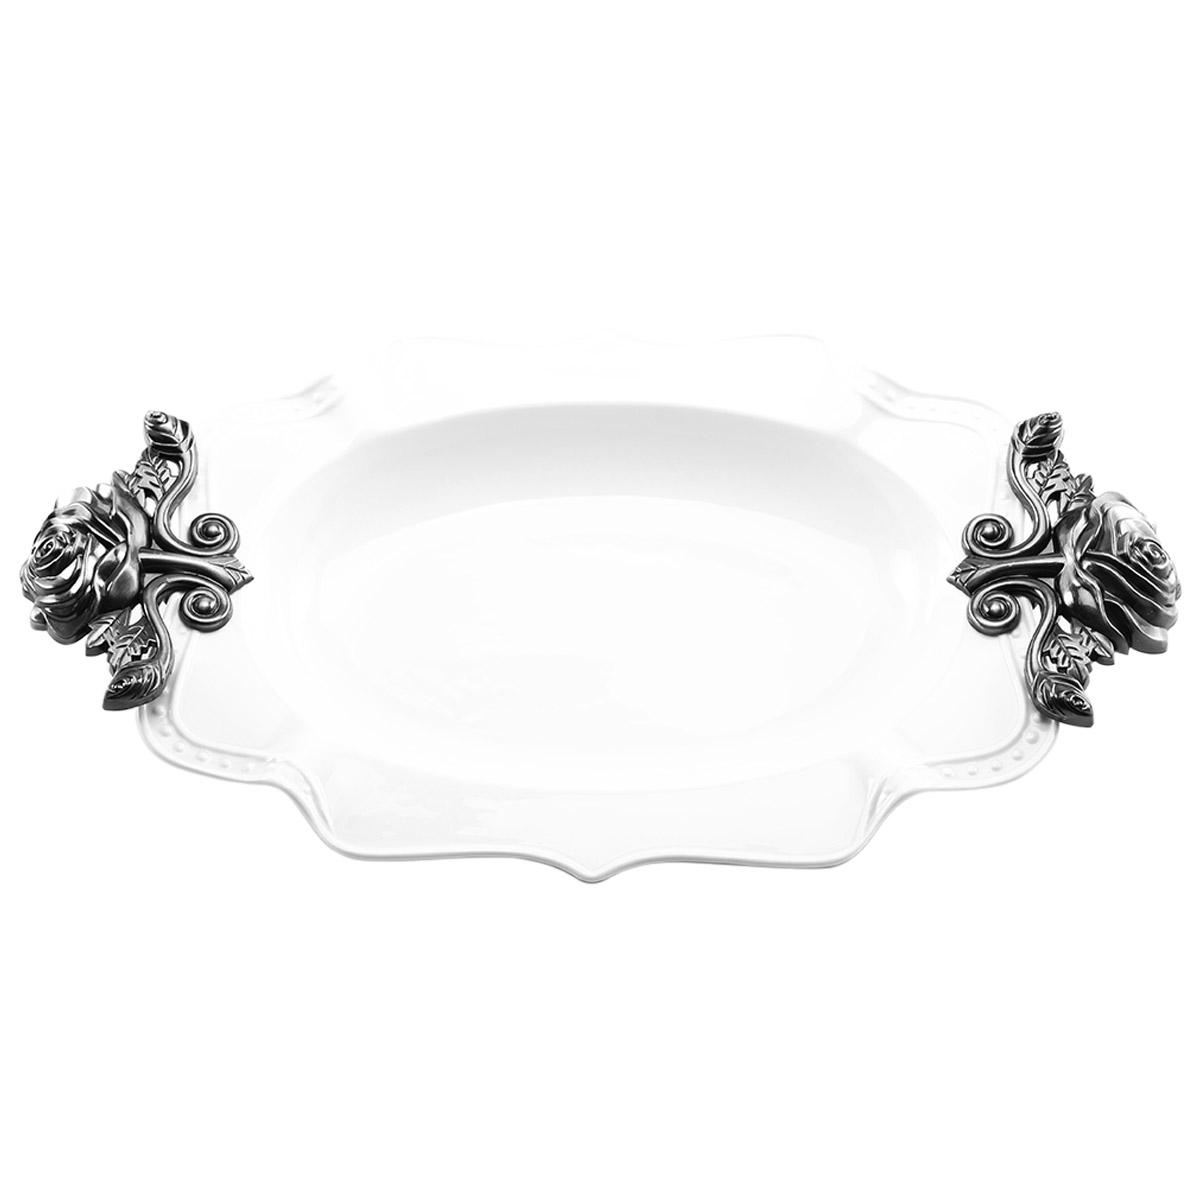 Platon Porcelana Hondo Blanco Agarraderas 38cm Crown Baccara